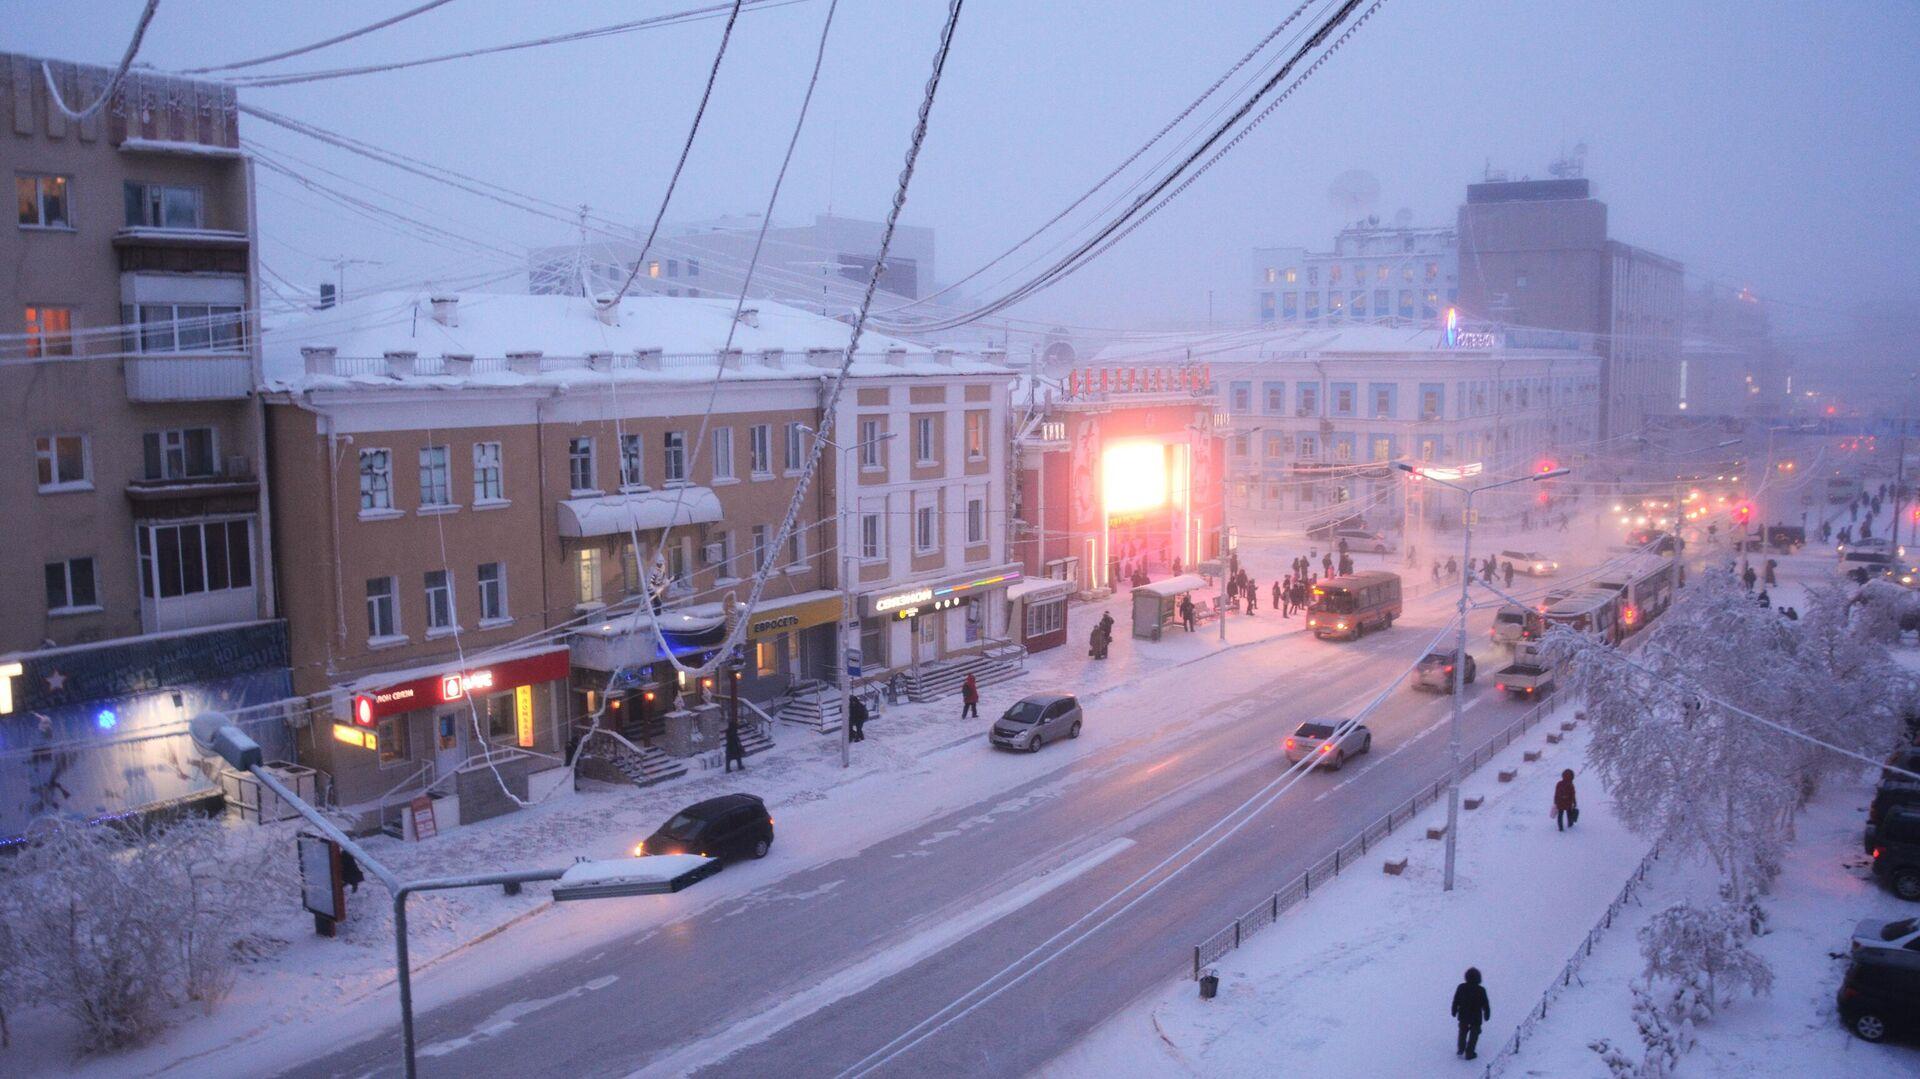 Проспект Ленина в городе Якутске - РИА Новости, 1920, 09.03.2021